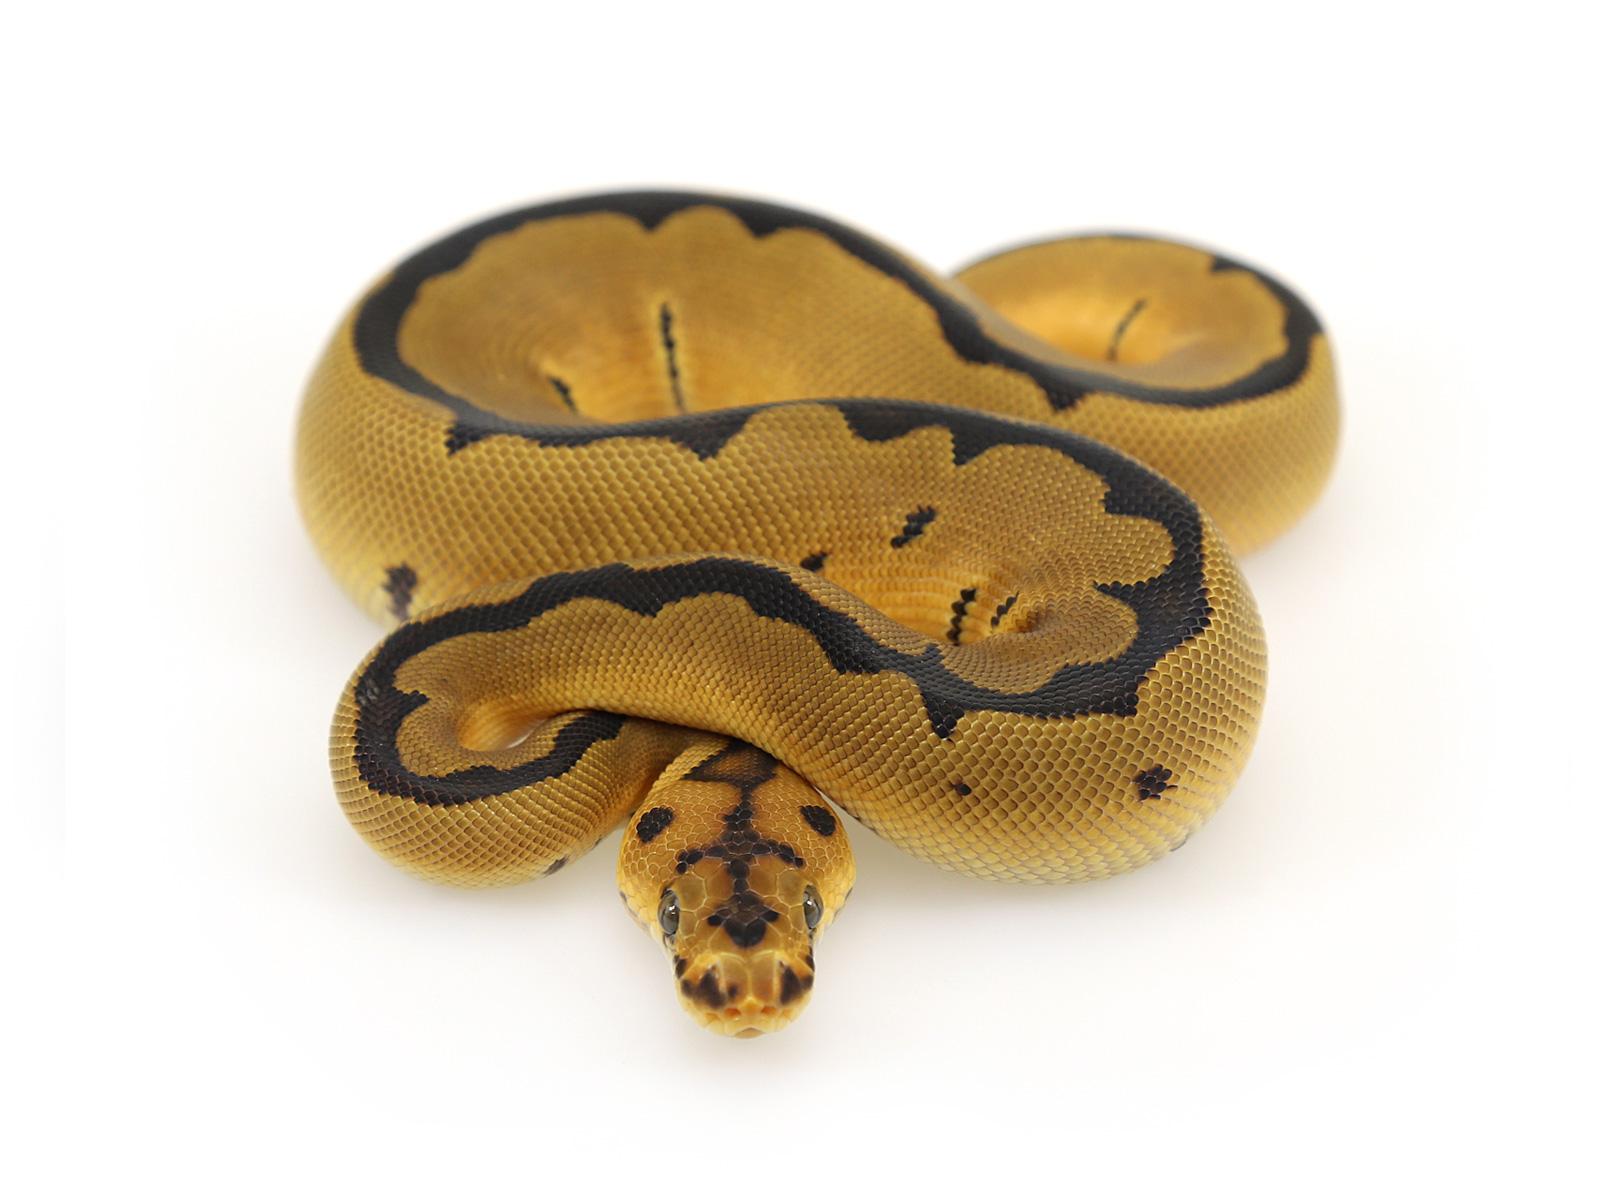 Pied clown ball python - photo#28